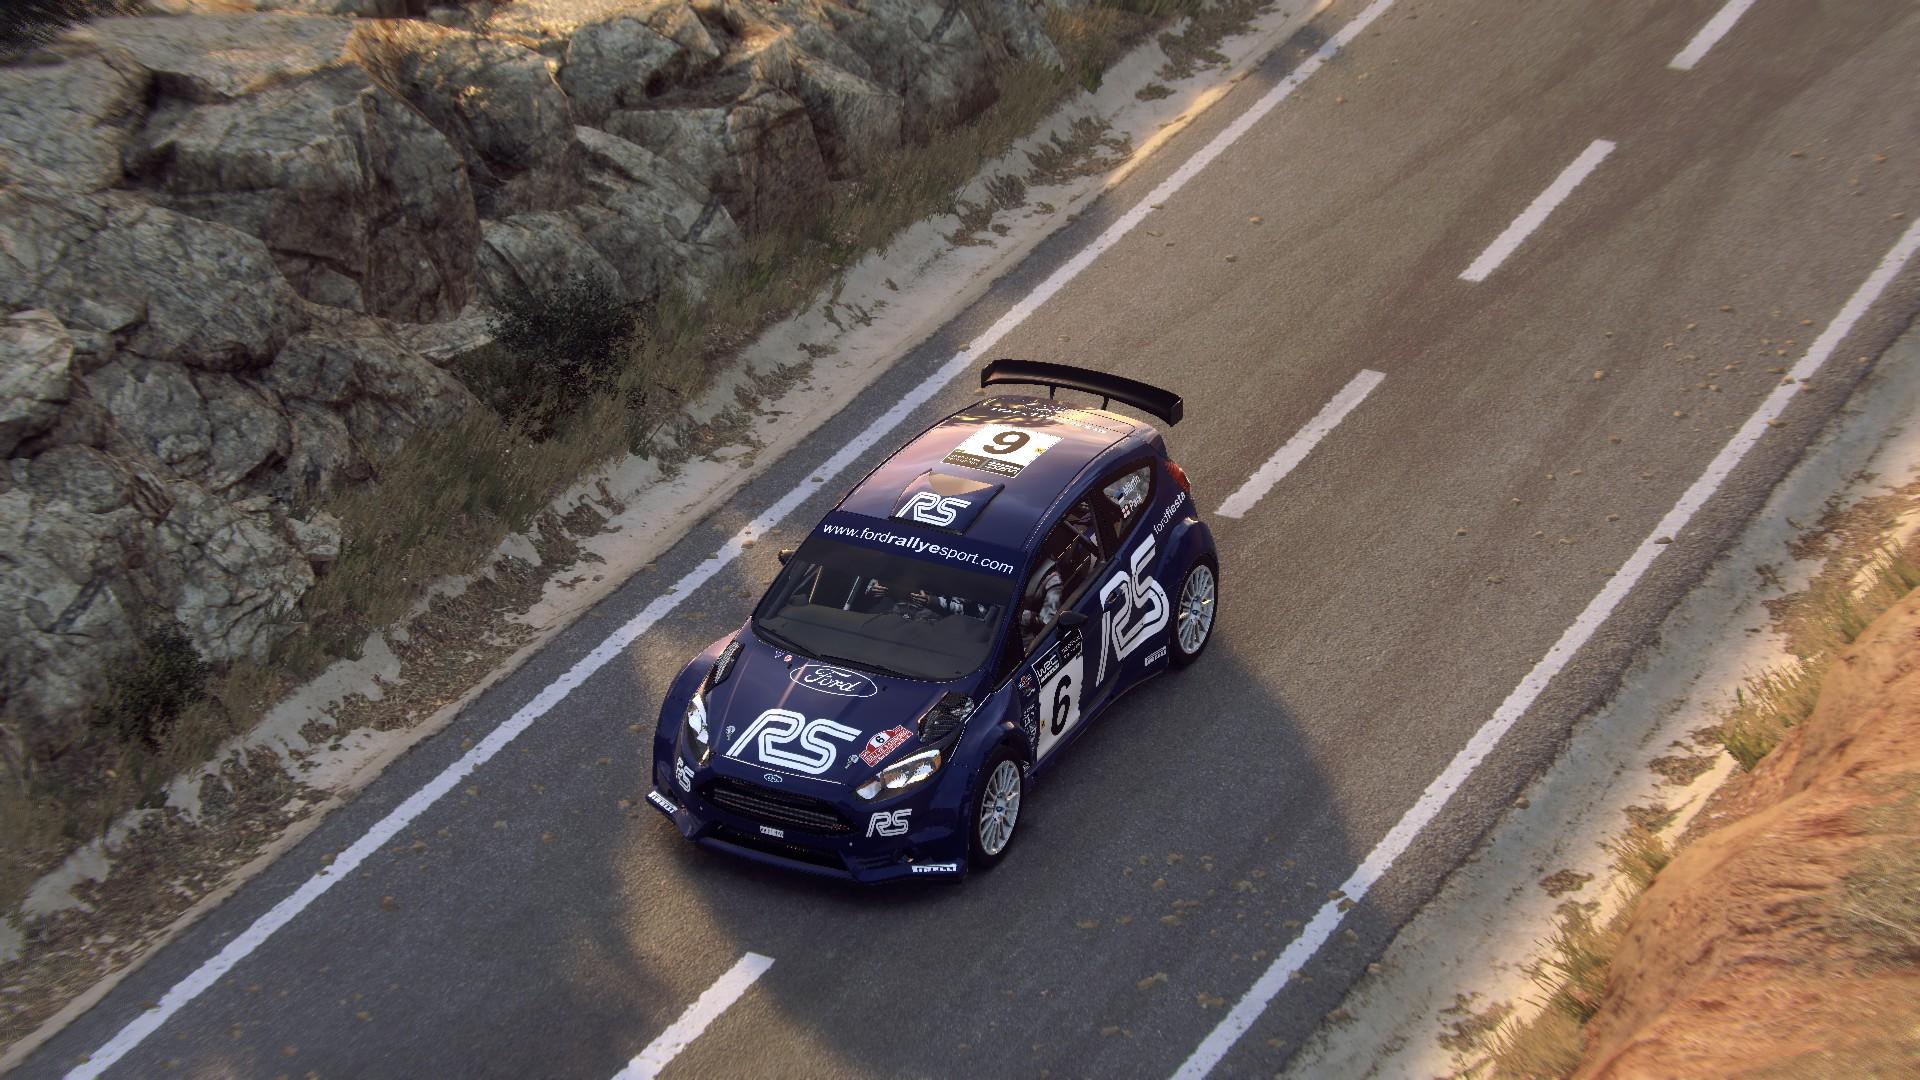 Ford Fiesta R5 (Märtin-Parks - Rallye Sanremo - Rallye d'Italia 2002 - Hommagge) (4).jpg